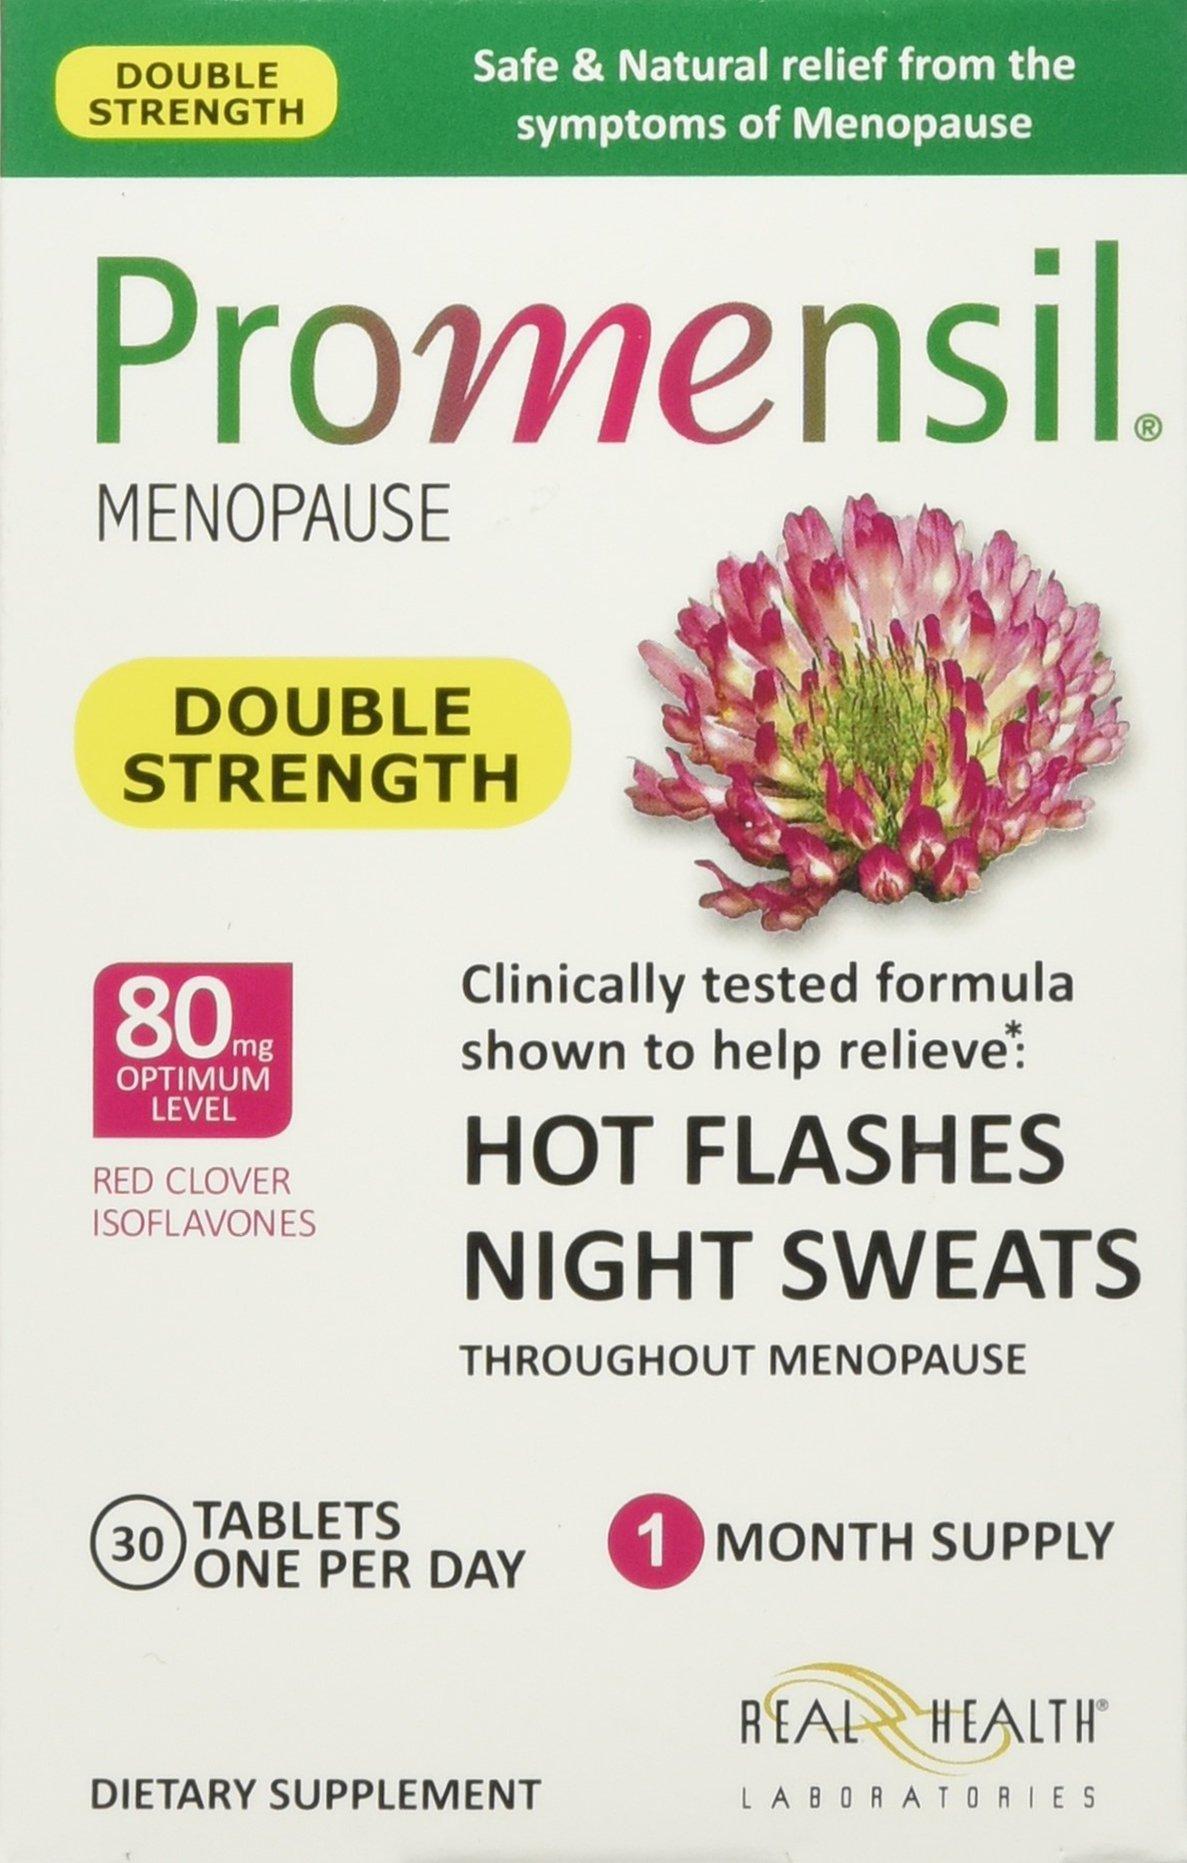 Amazon.com: Pharma Nord Omega 7 (Sea Buckthorne Oil) 60 Vegicapsules: Health & Personal Care